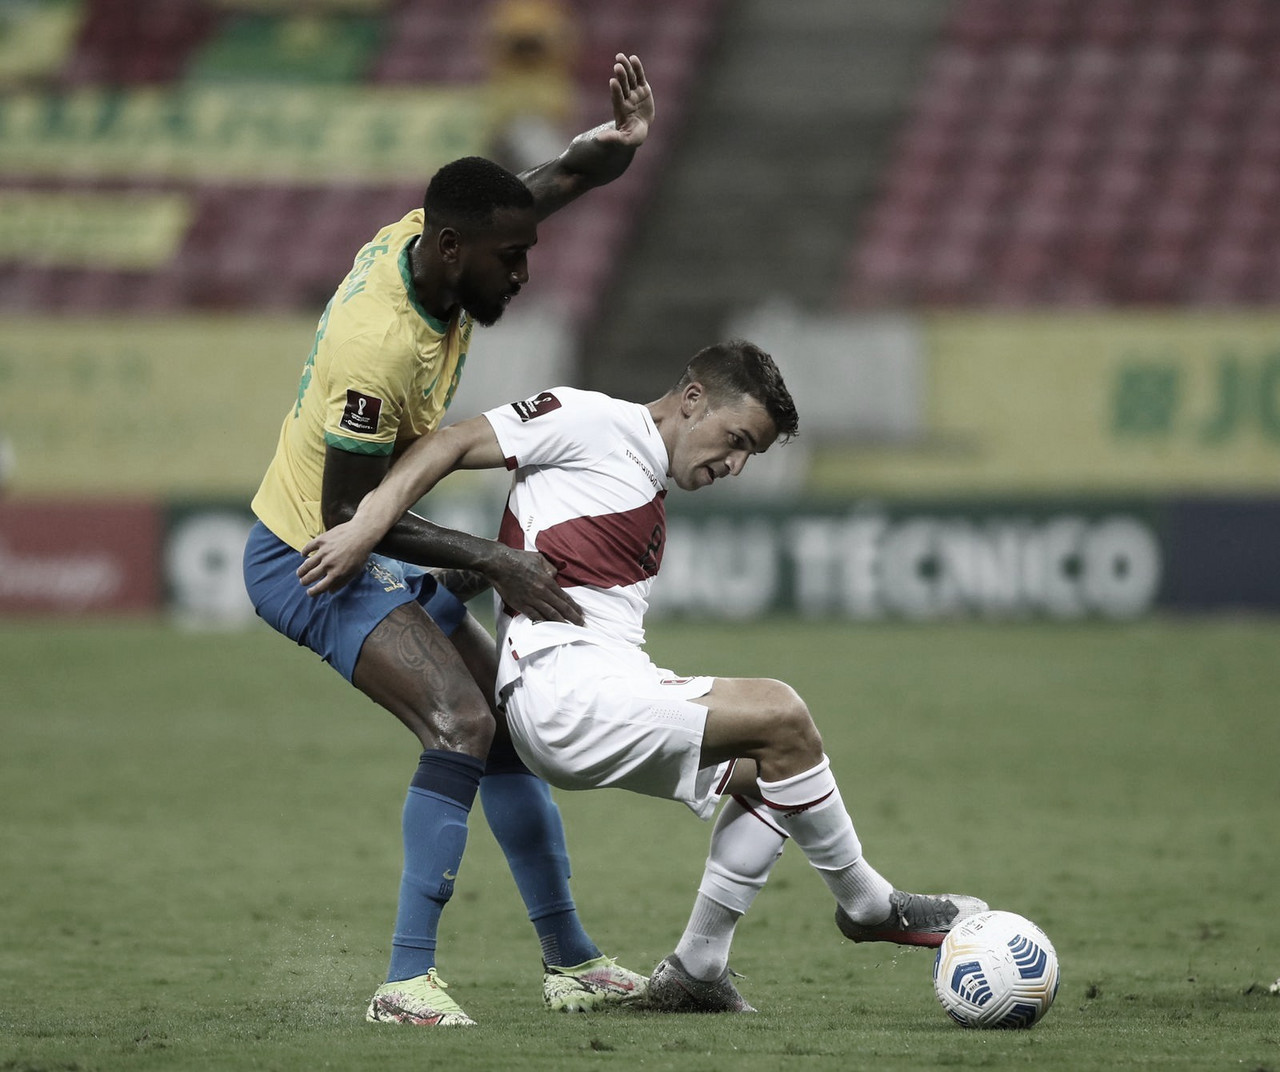 Brasil 2-0 Perú: la blanquirroja vuelve a complicarse camino a Qatar 2022